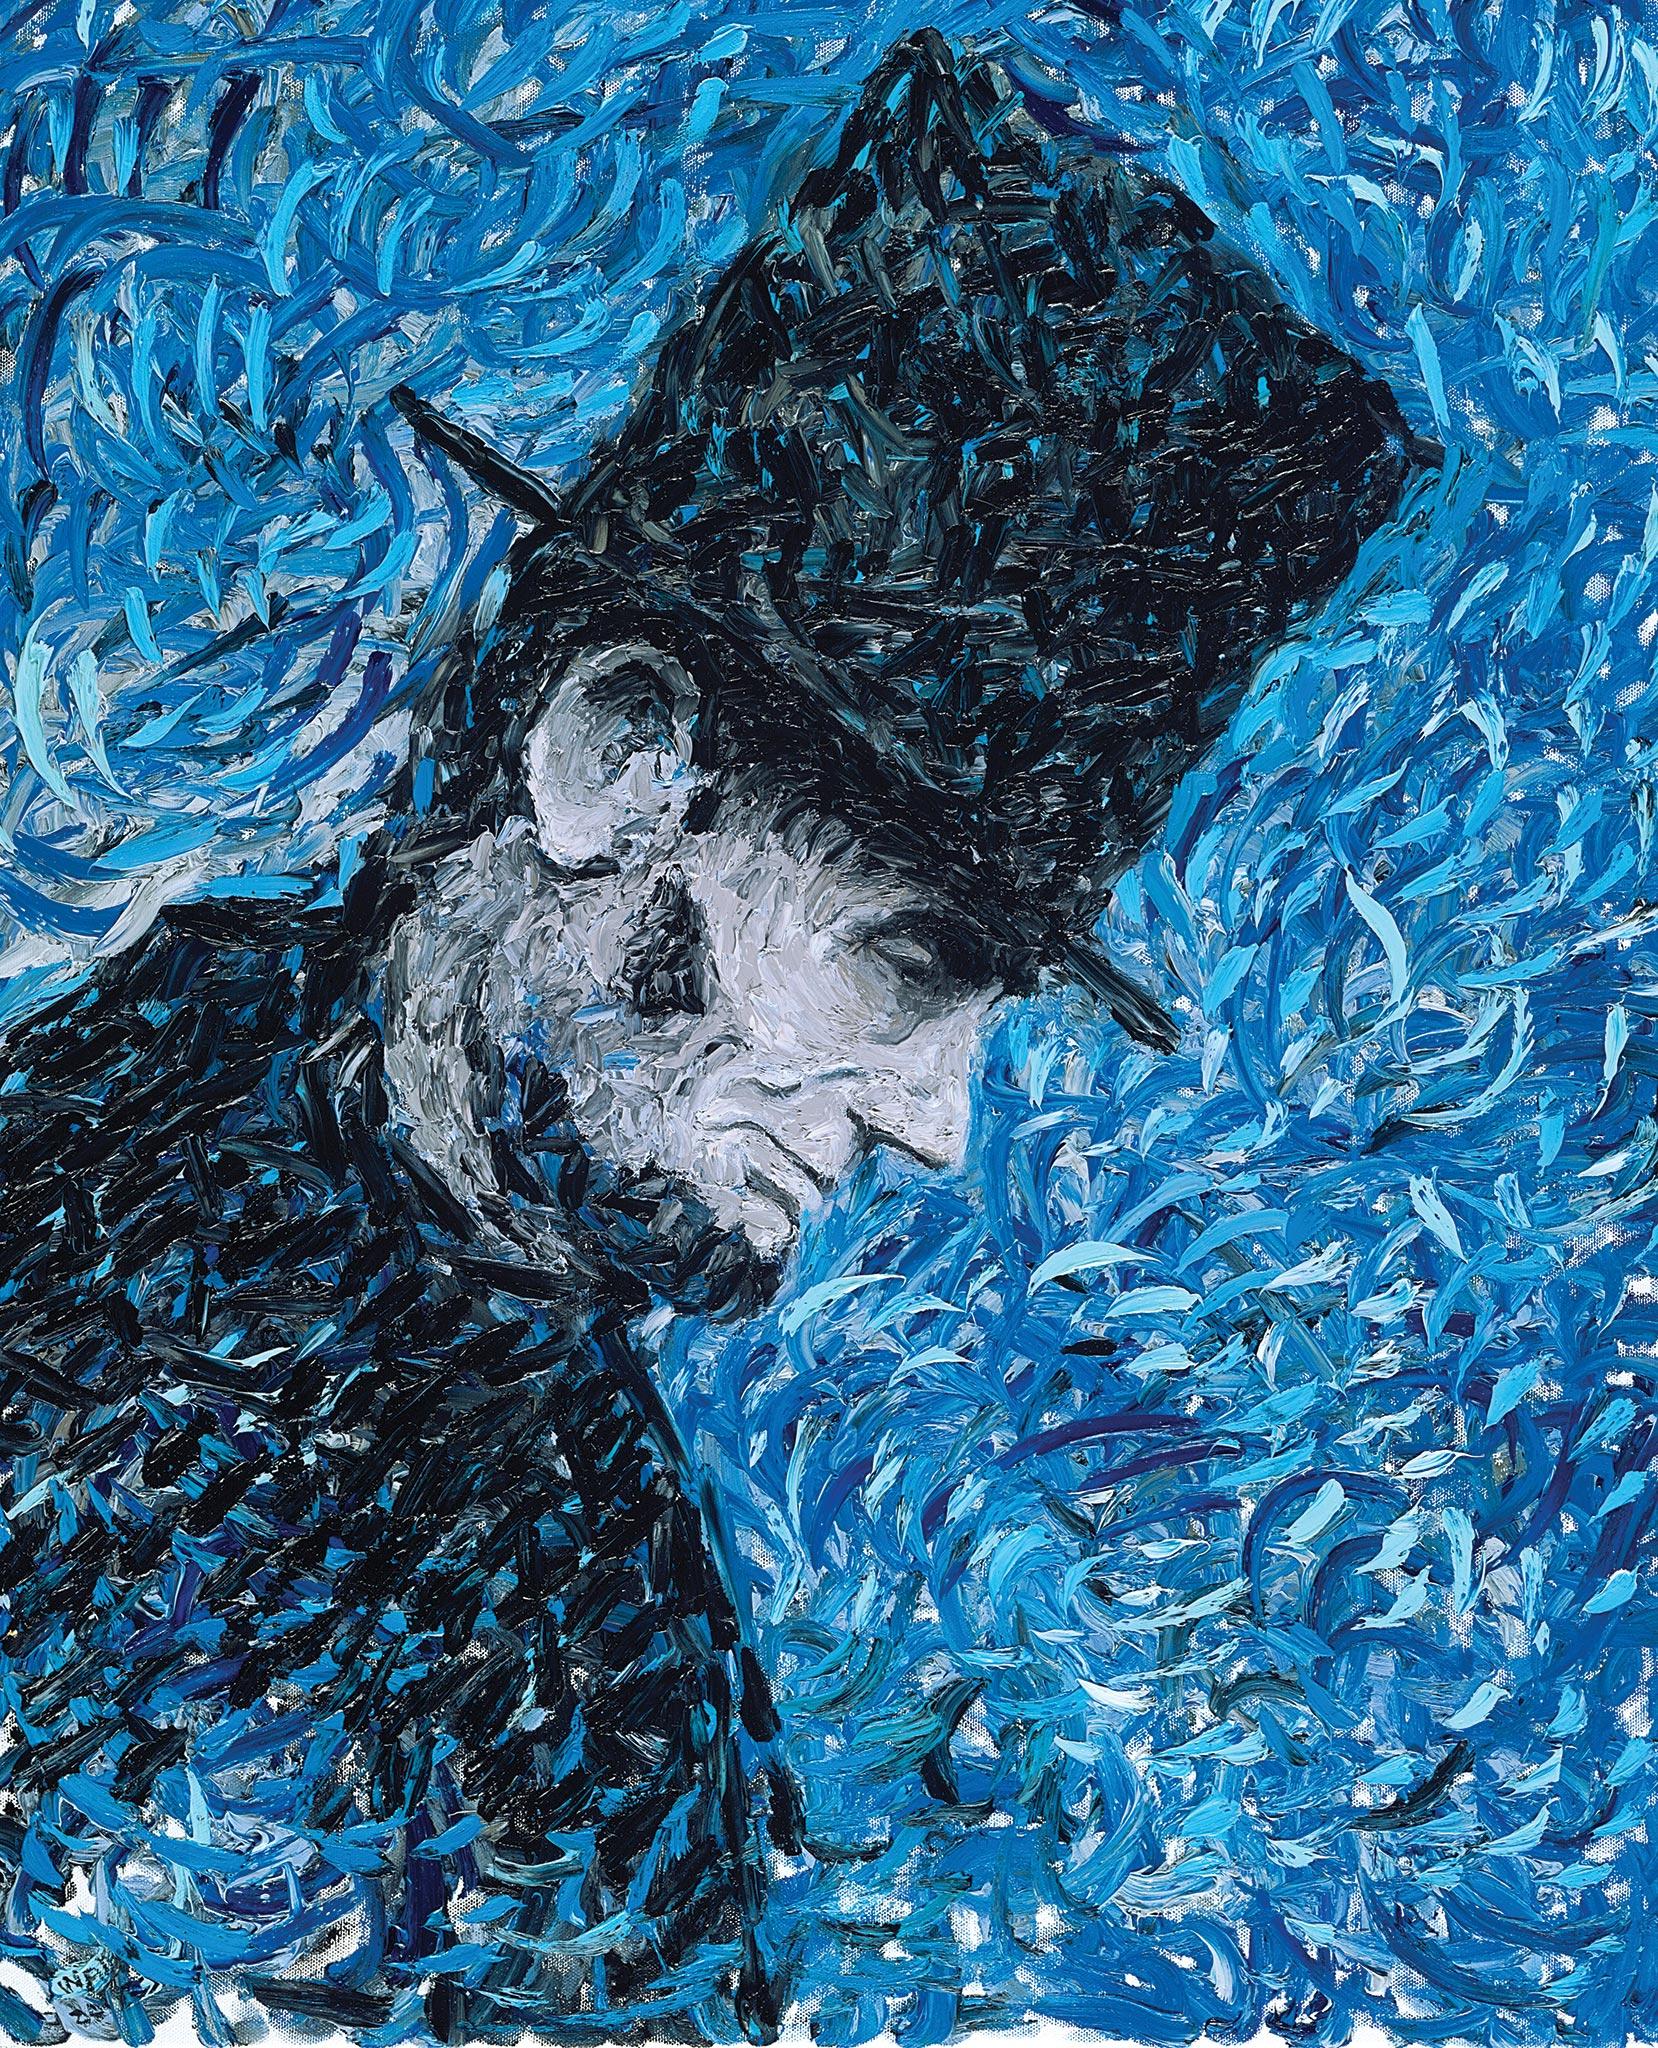 Lincoln 224, Wendy Allen, Oil on Canvas